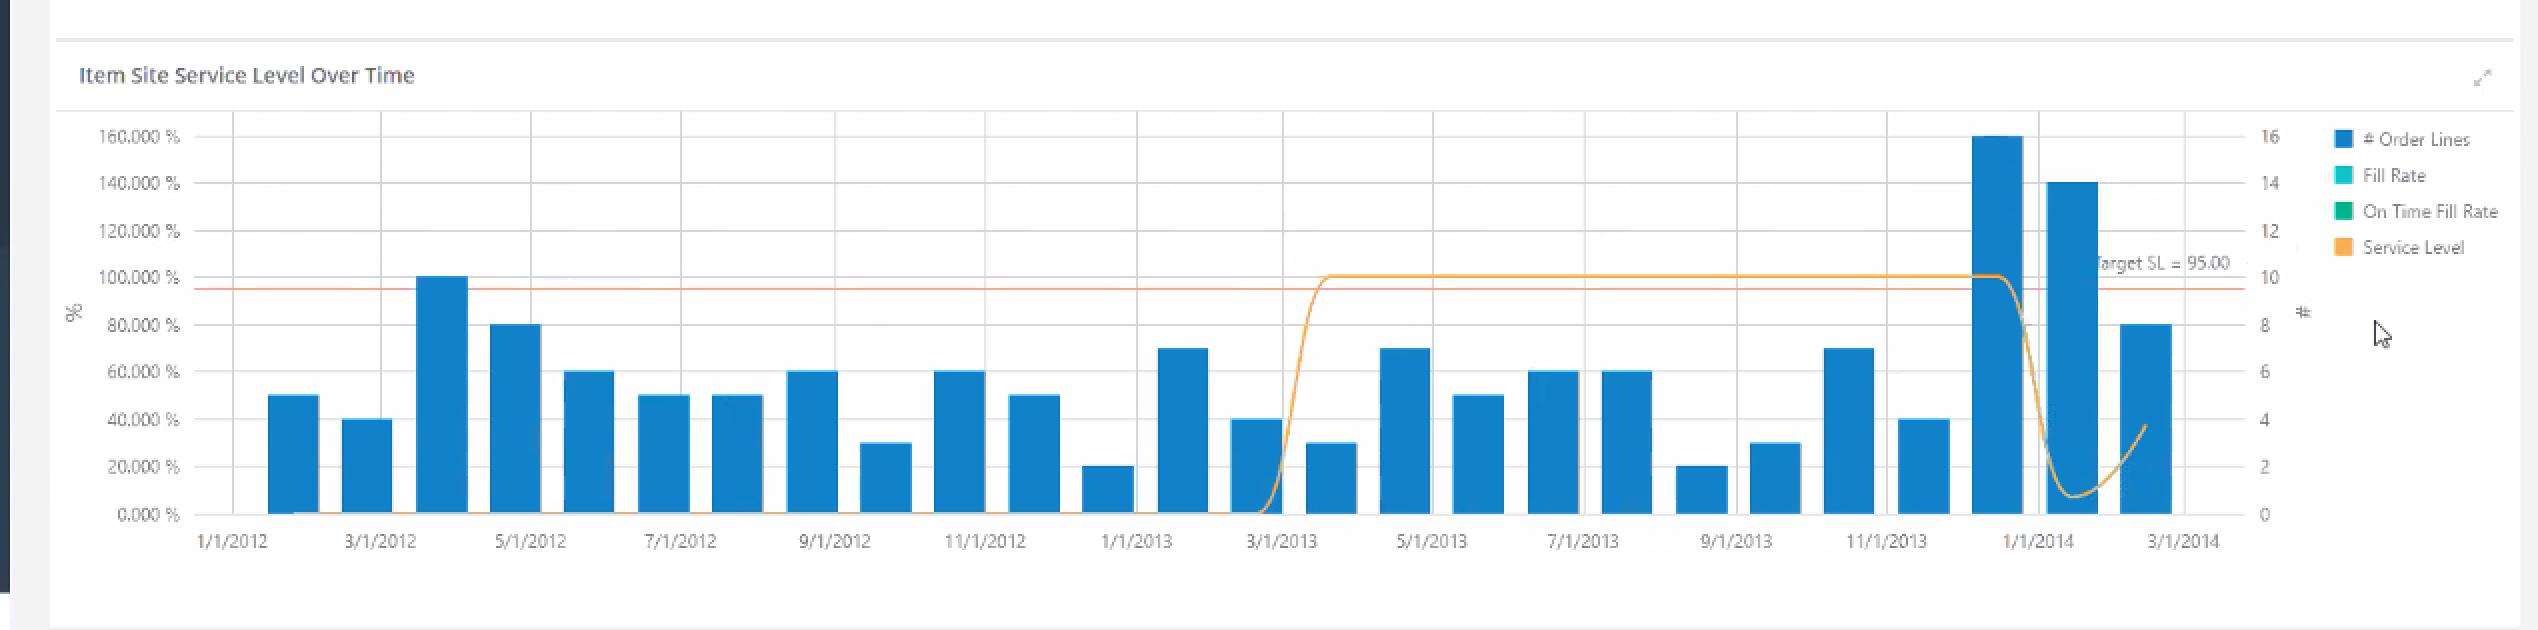 StockIQ Software - Metrics and reporting